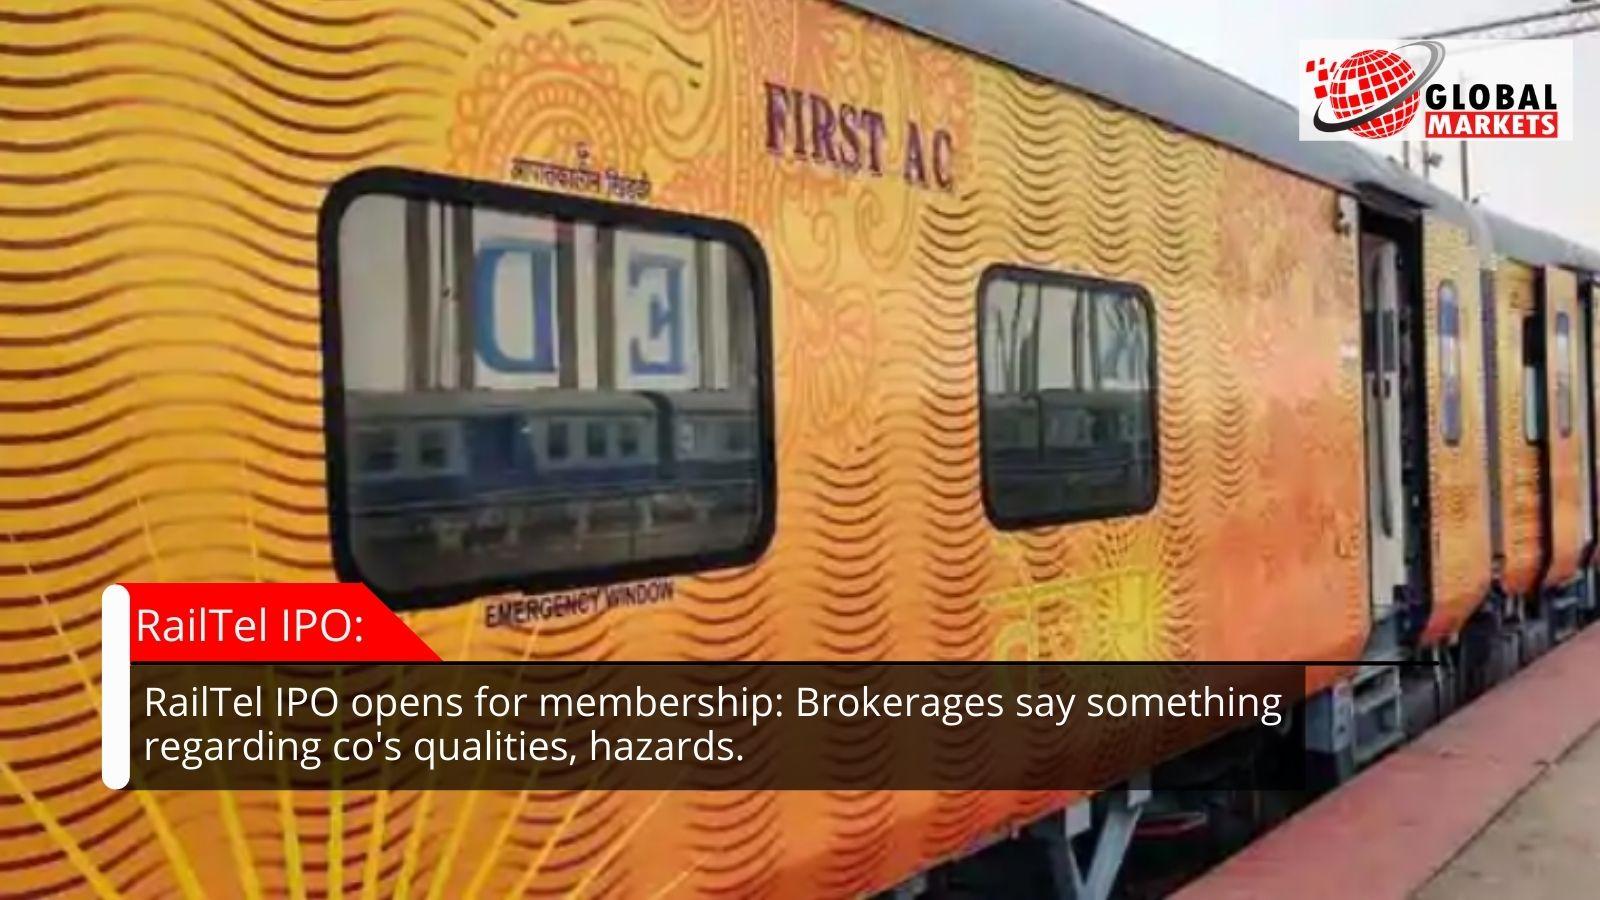 RailTel IPO opens for membership: Brokerages say something regarding co's qualities, hazards.